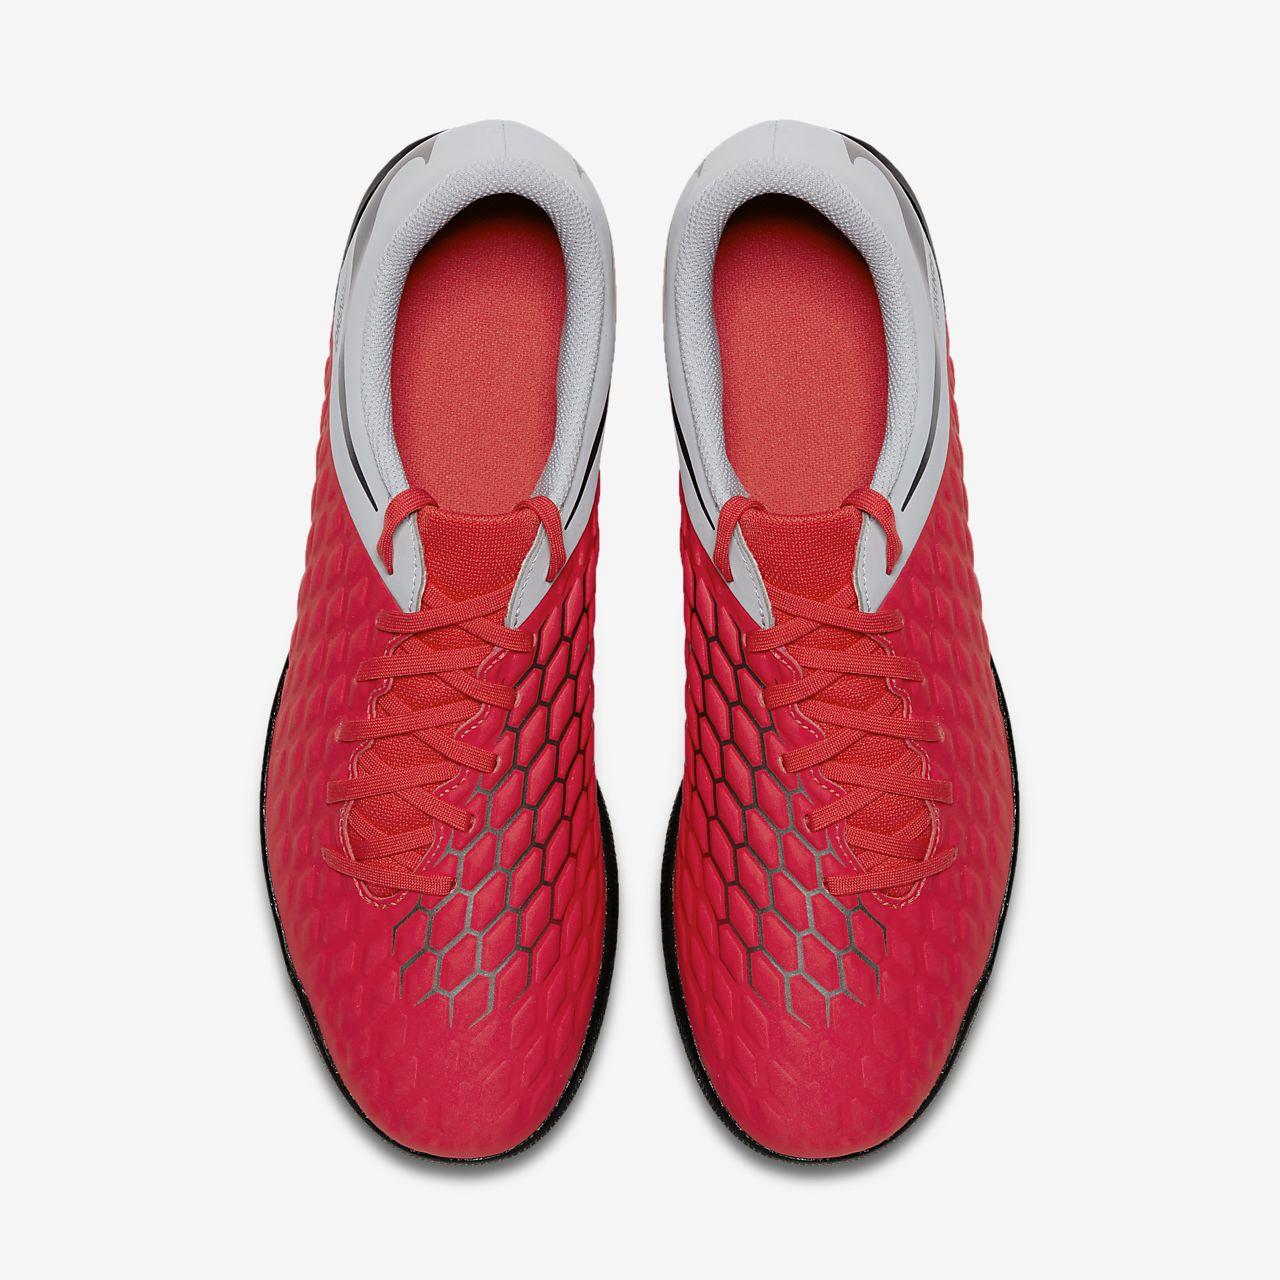 new concept 7c8fe a35c8 Nike HypervenomX Phantom III Club IC Indoor/Court Football Shoe